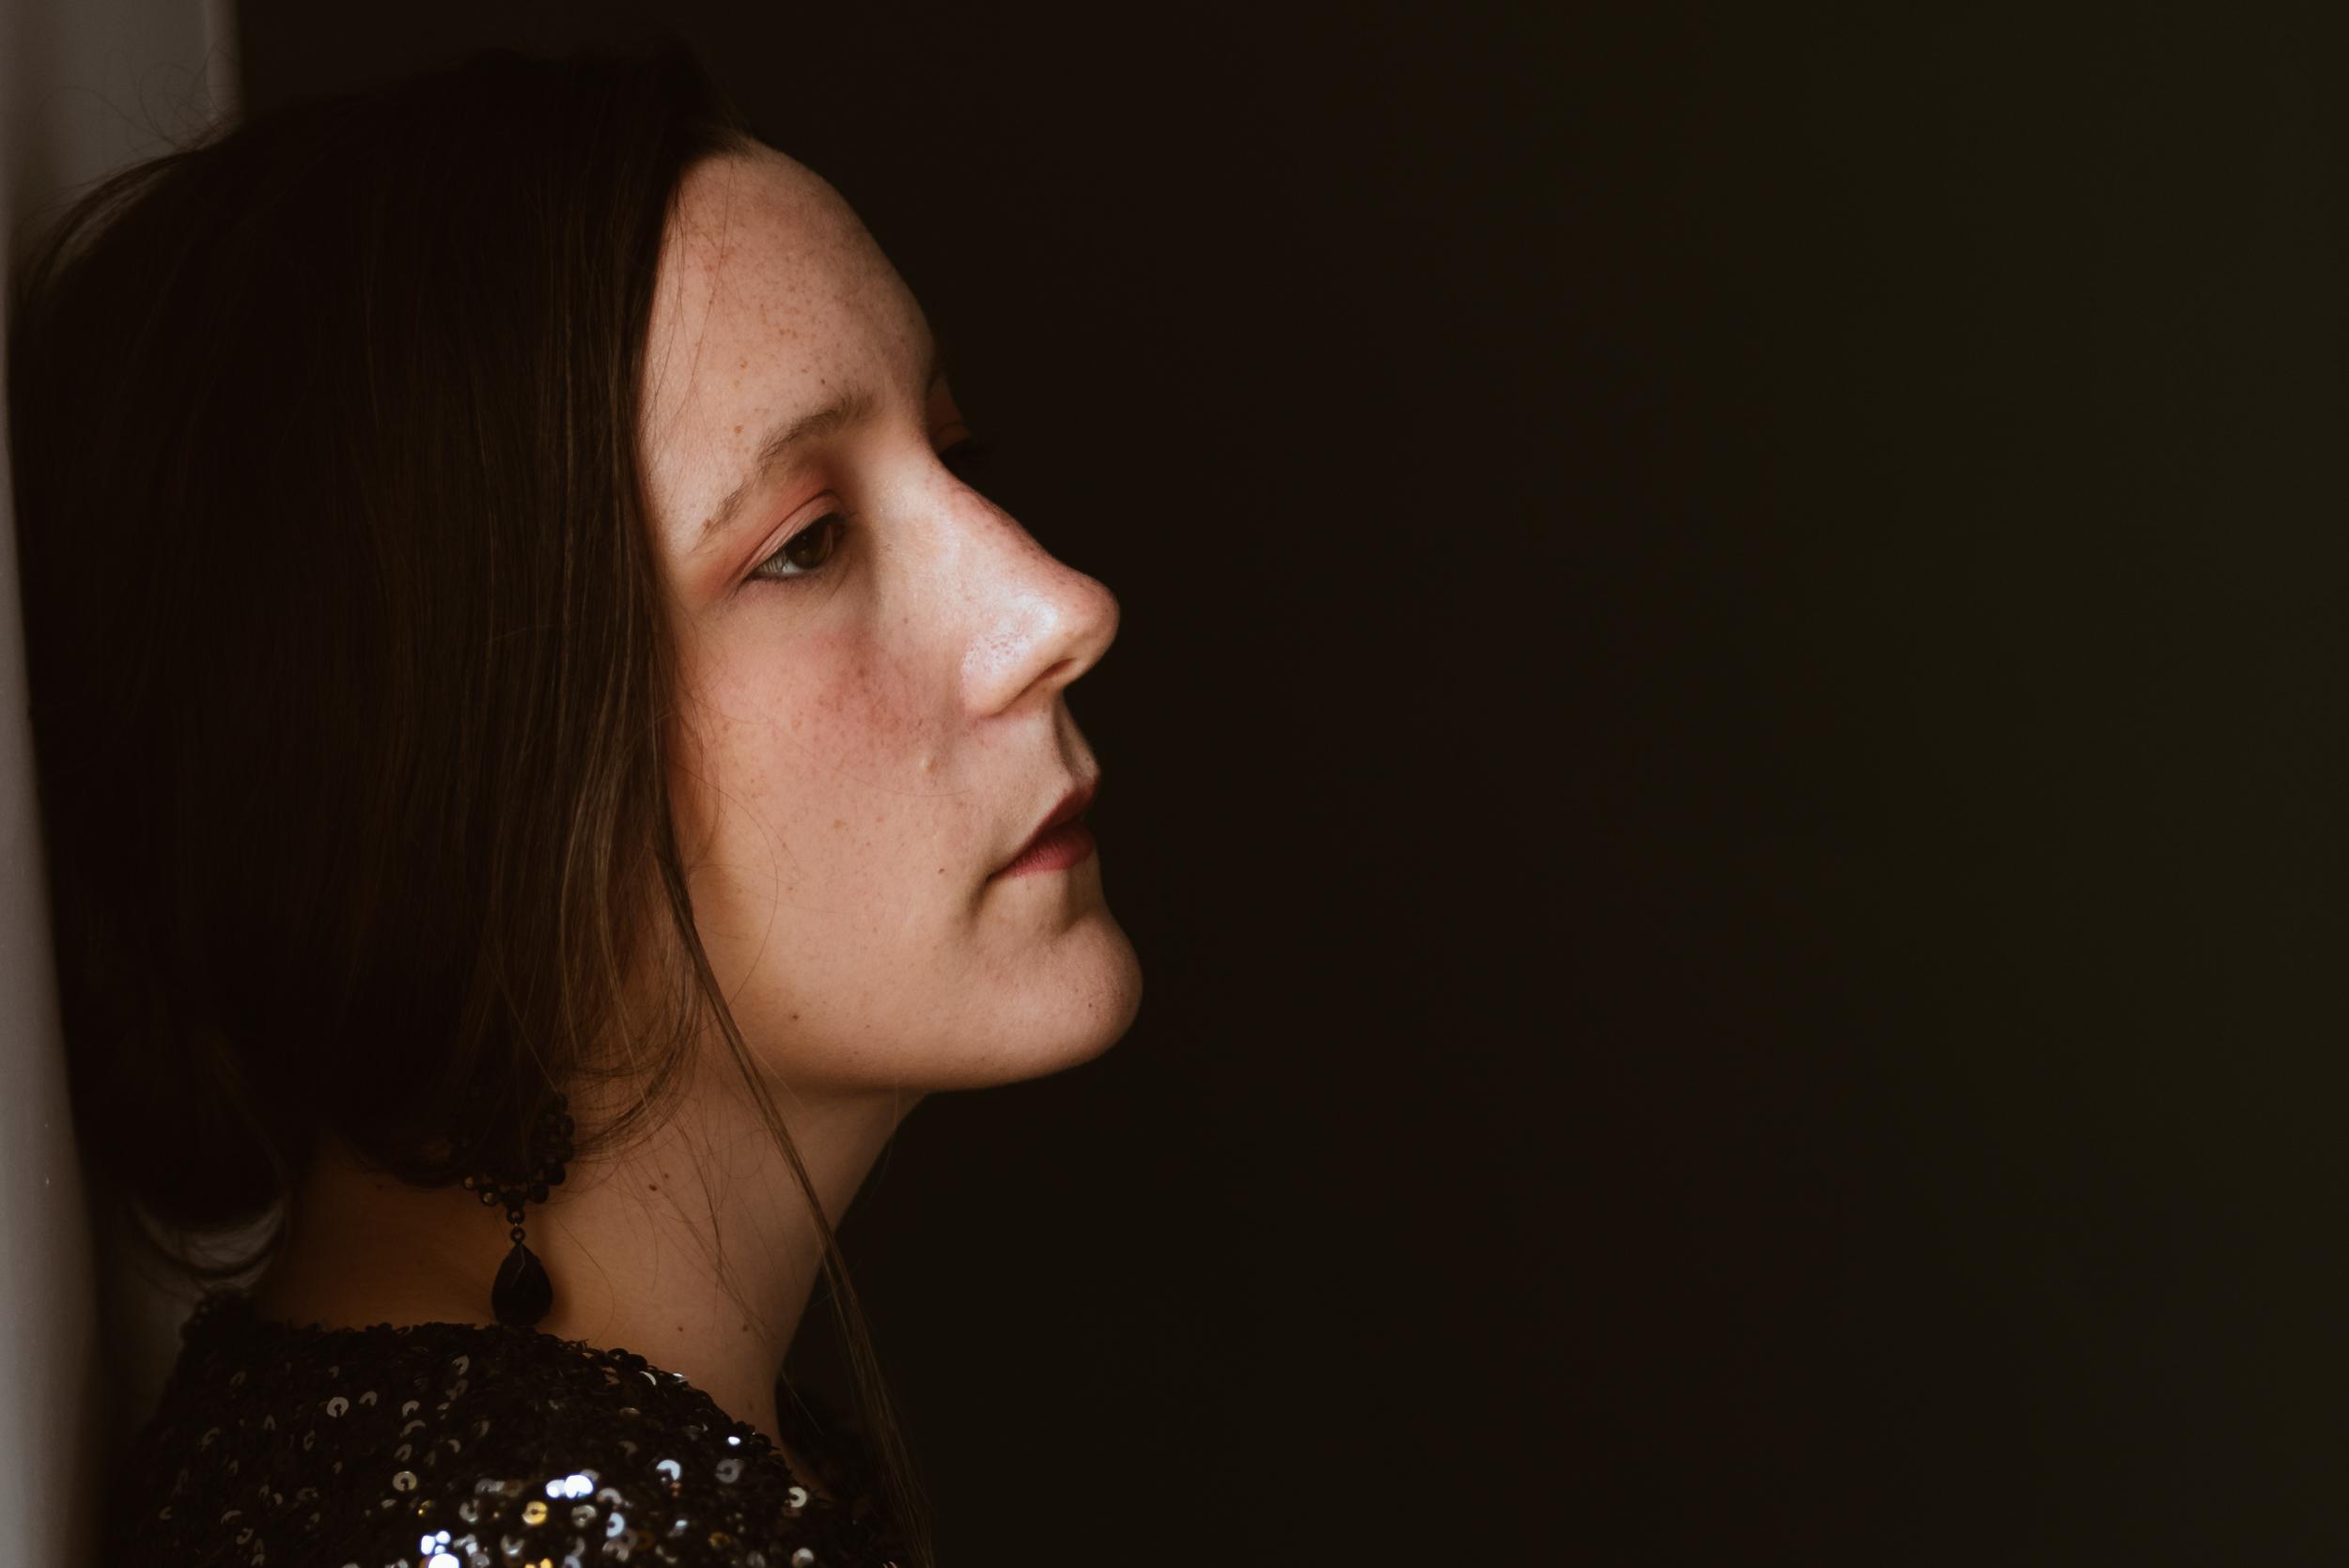 20190907-AmandaLewis-PortraitsCassRudolph-SocialMediaSize-6.jpg